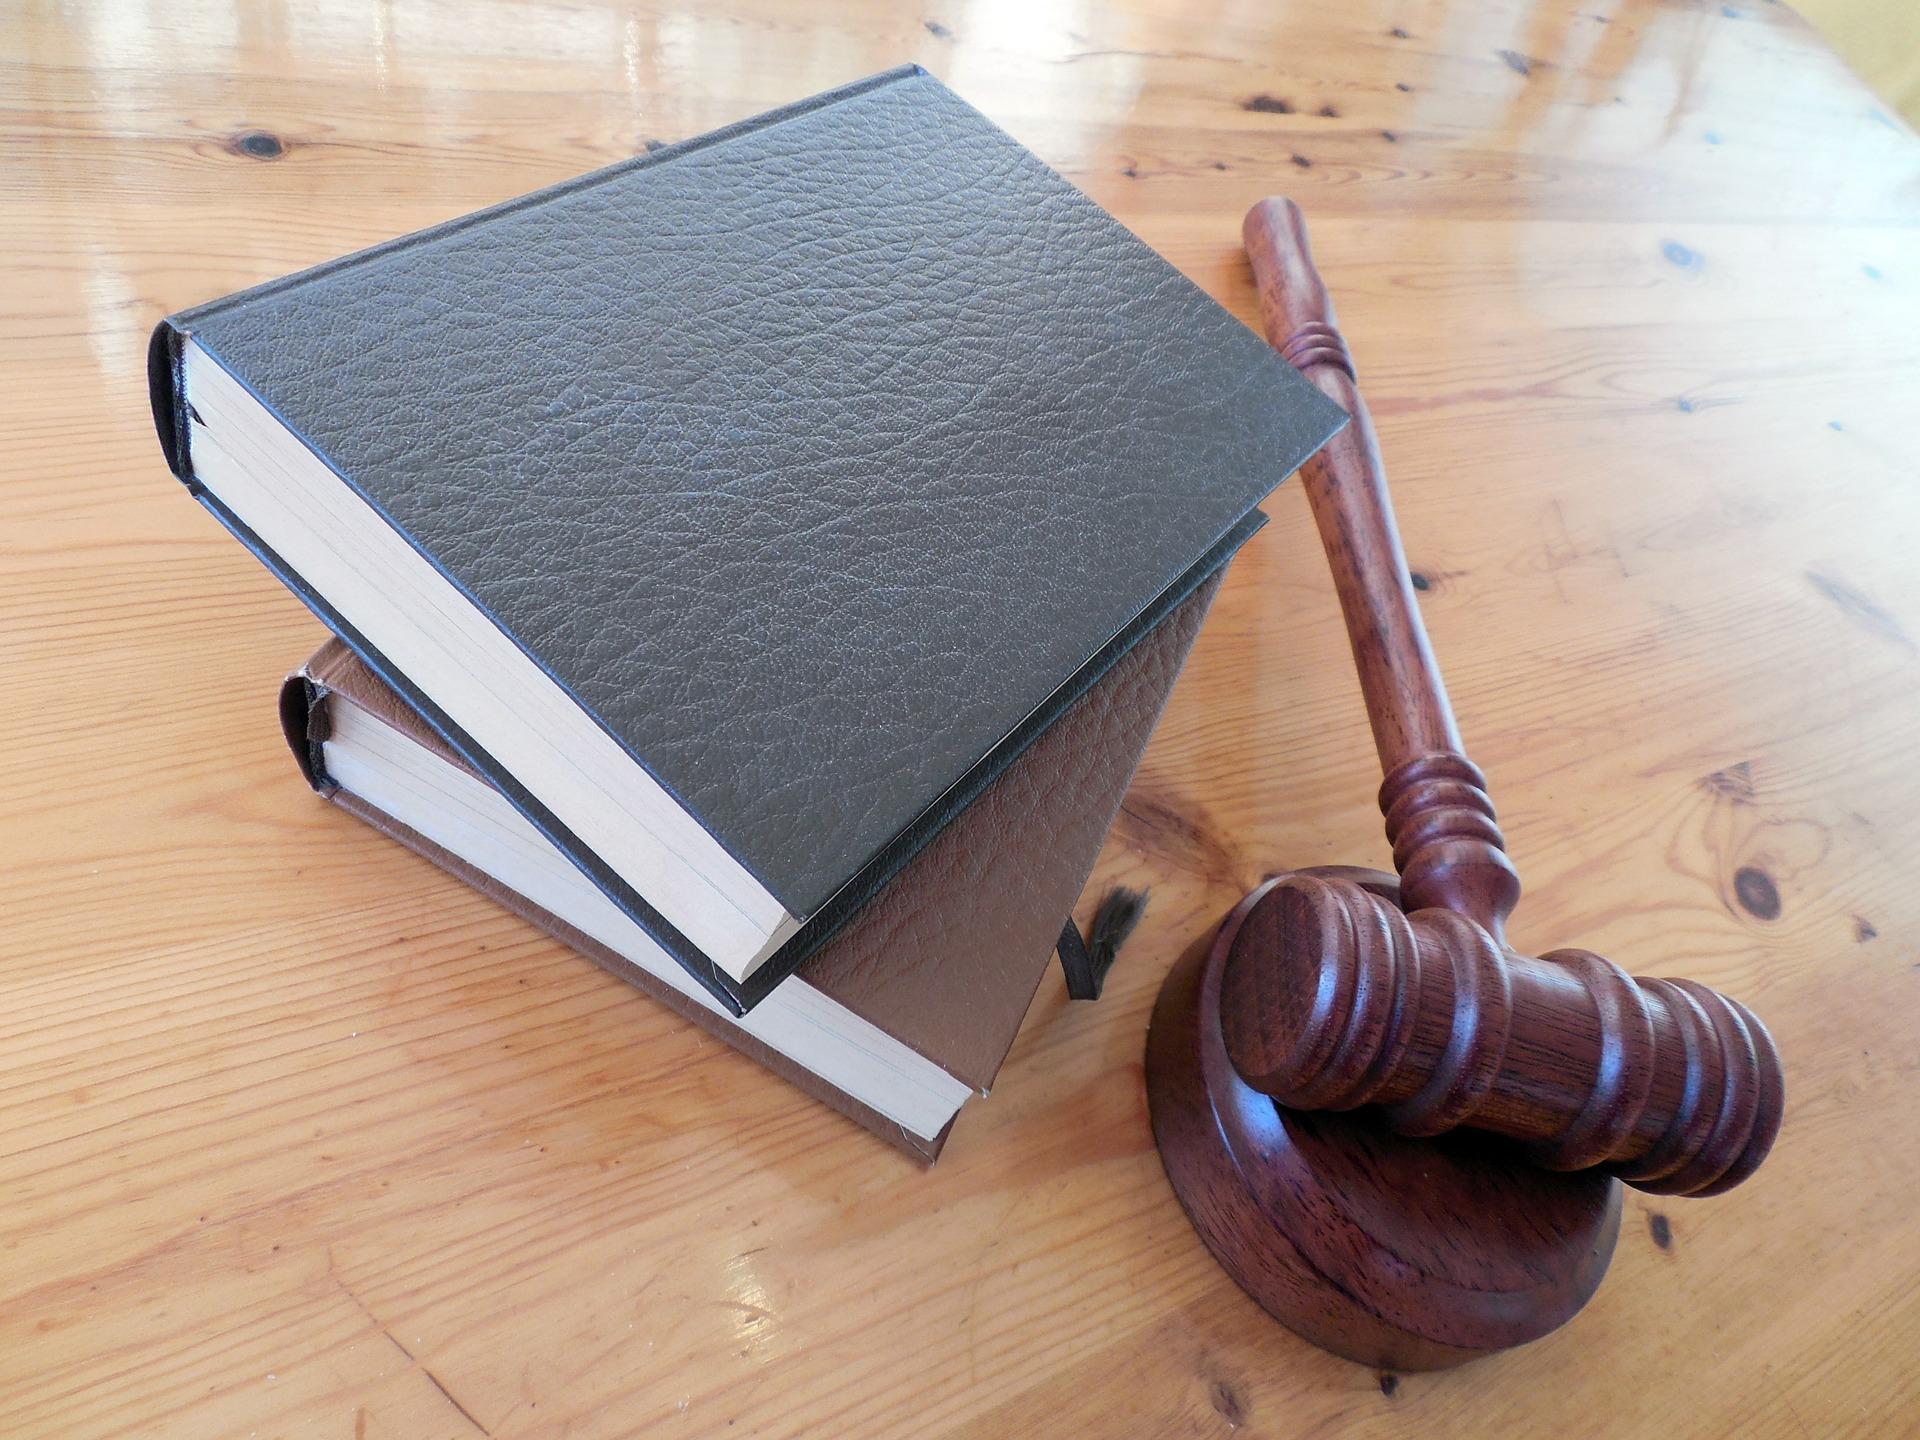 Courts should judge, not legislate - Carolina Journal